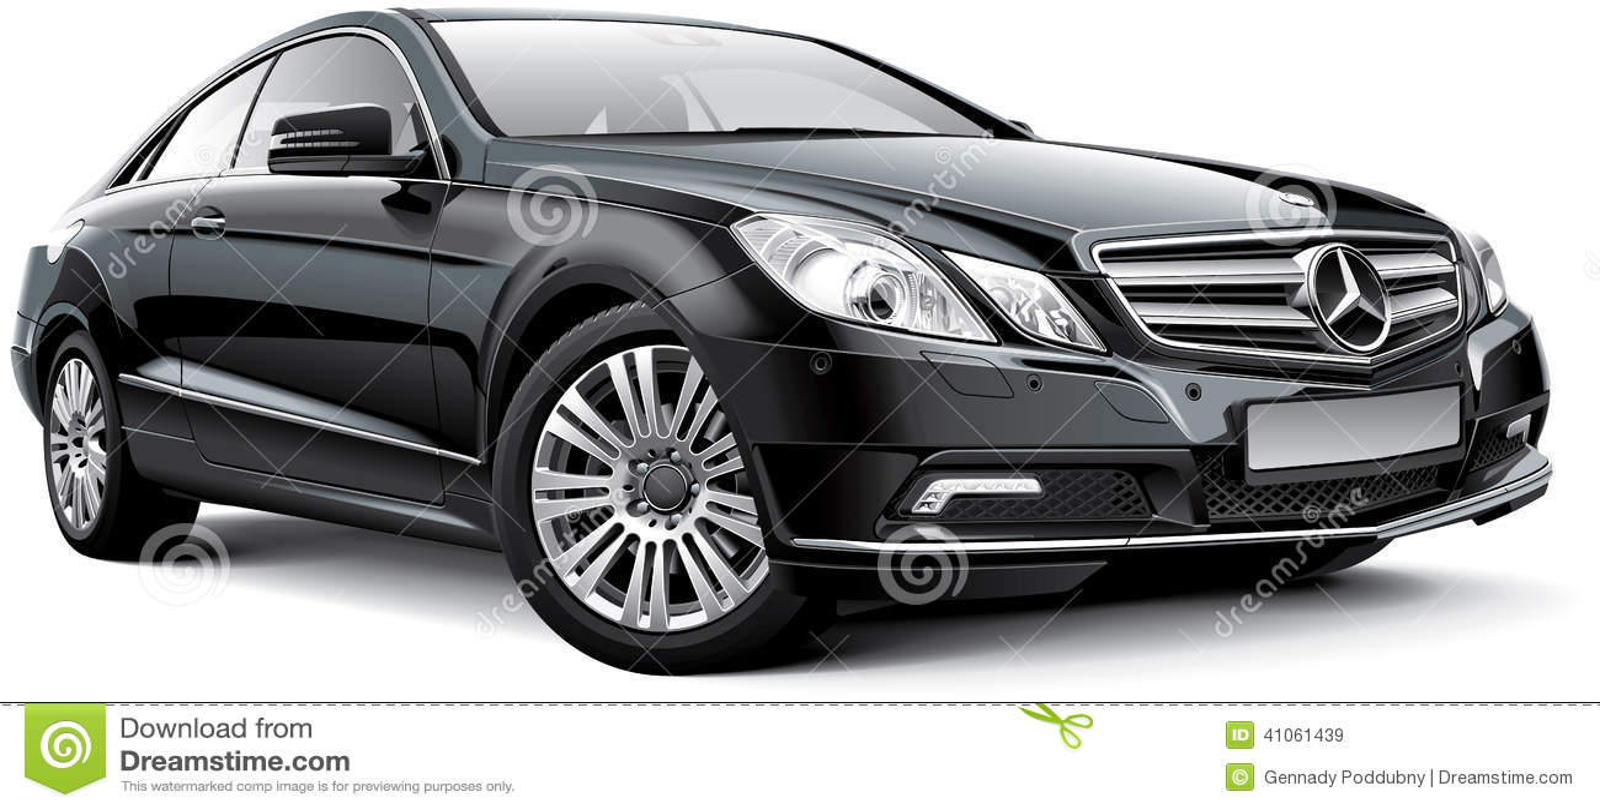 Mercedes Benz E Class W212 Coupe Editorial Stock Image